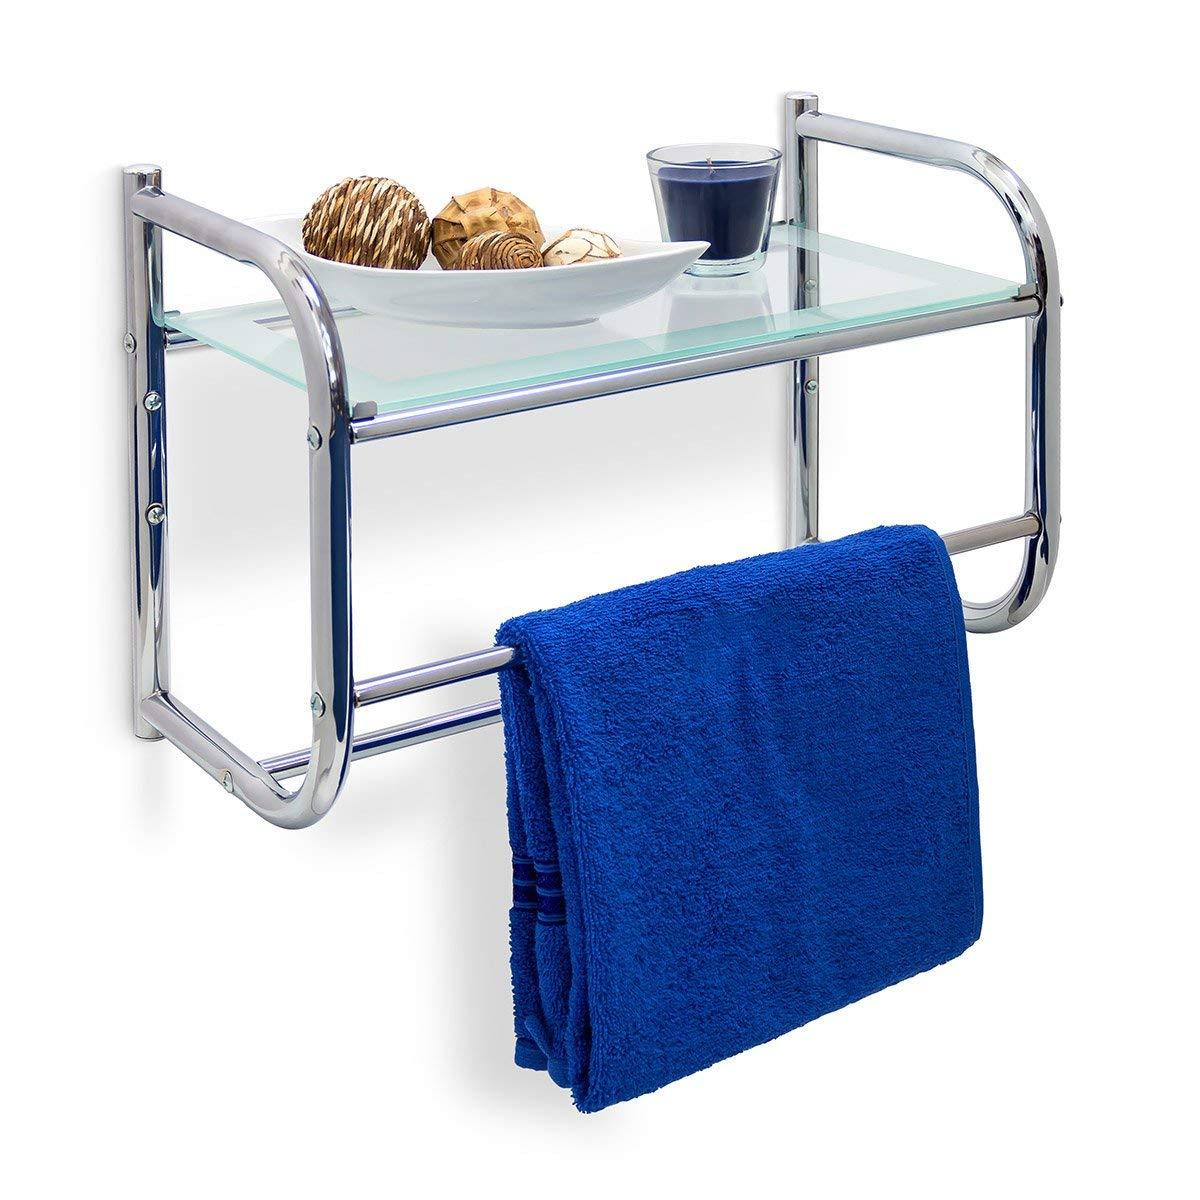 Relaxdays de pared fabricado en acero inoxidable con toallero & Glass-estante de H x